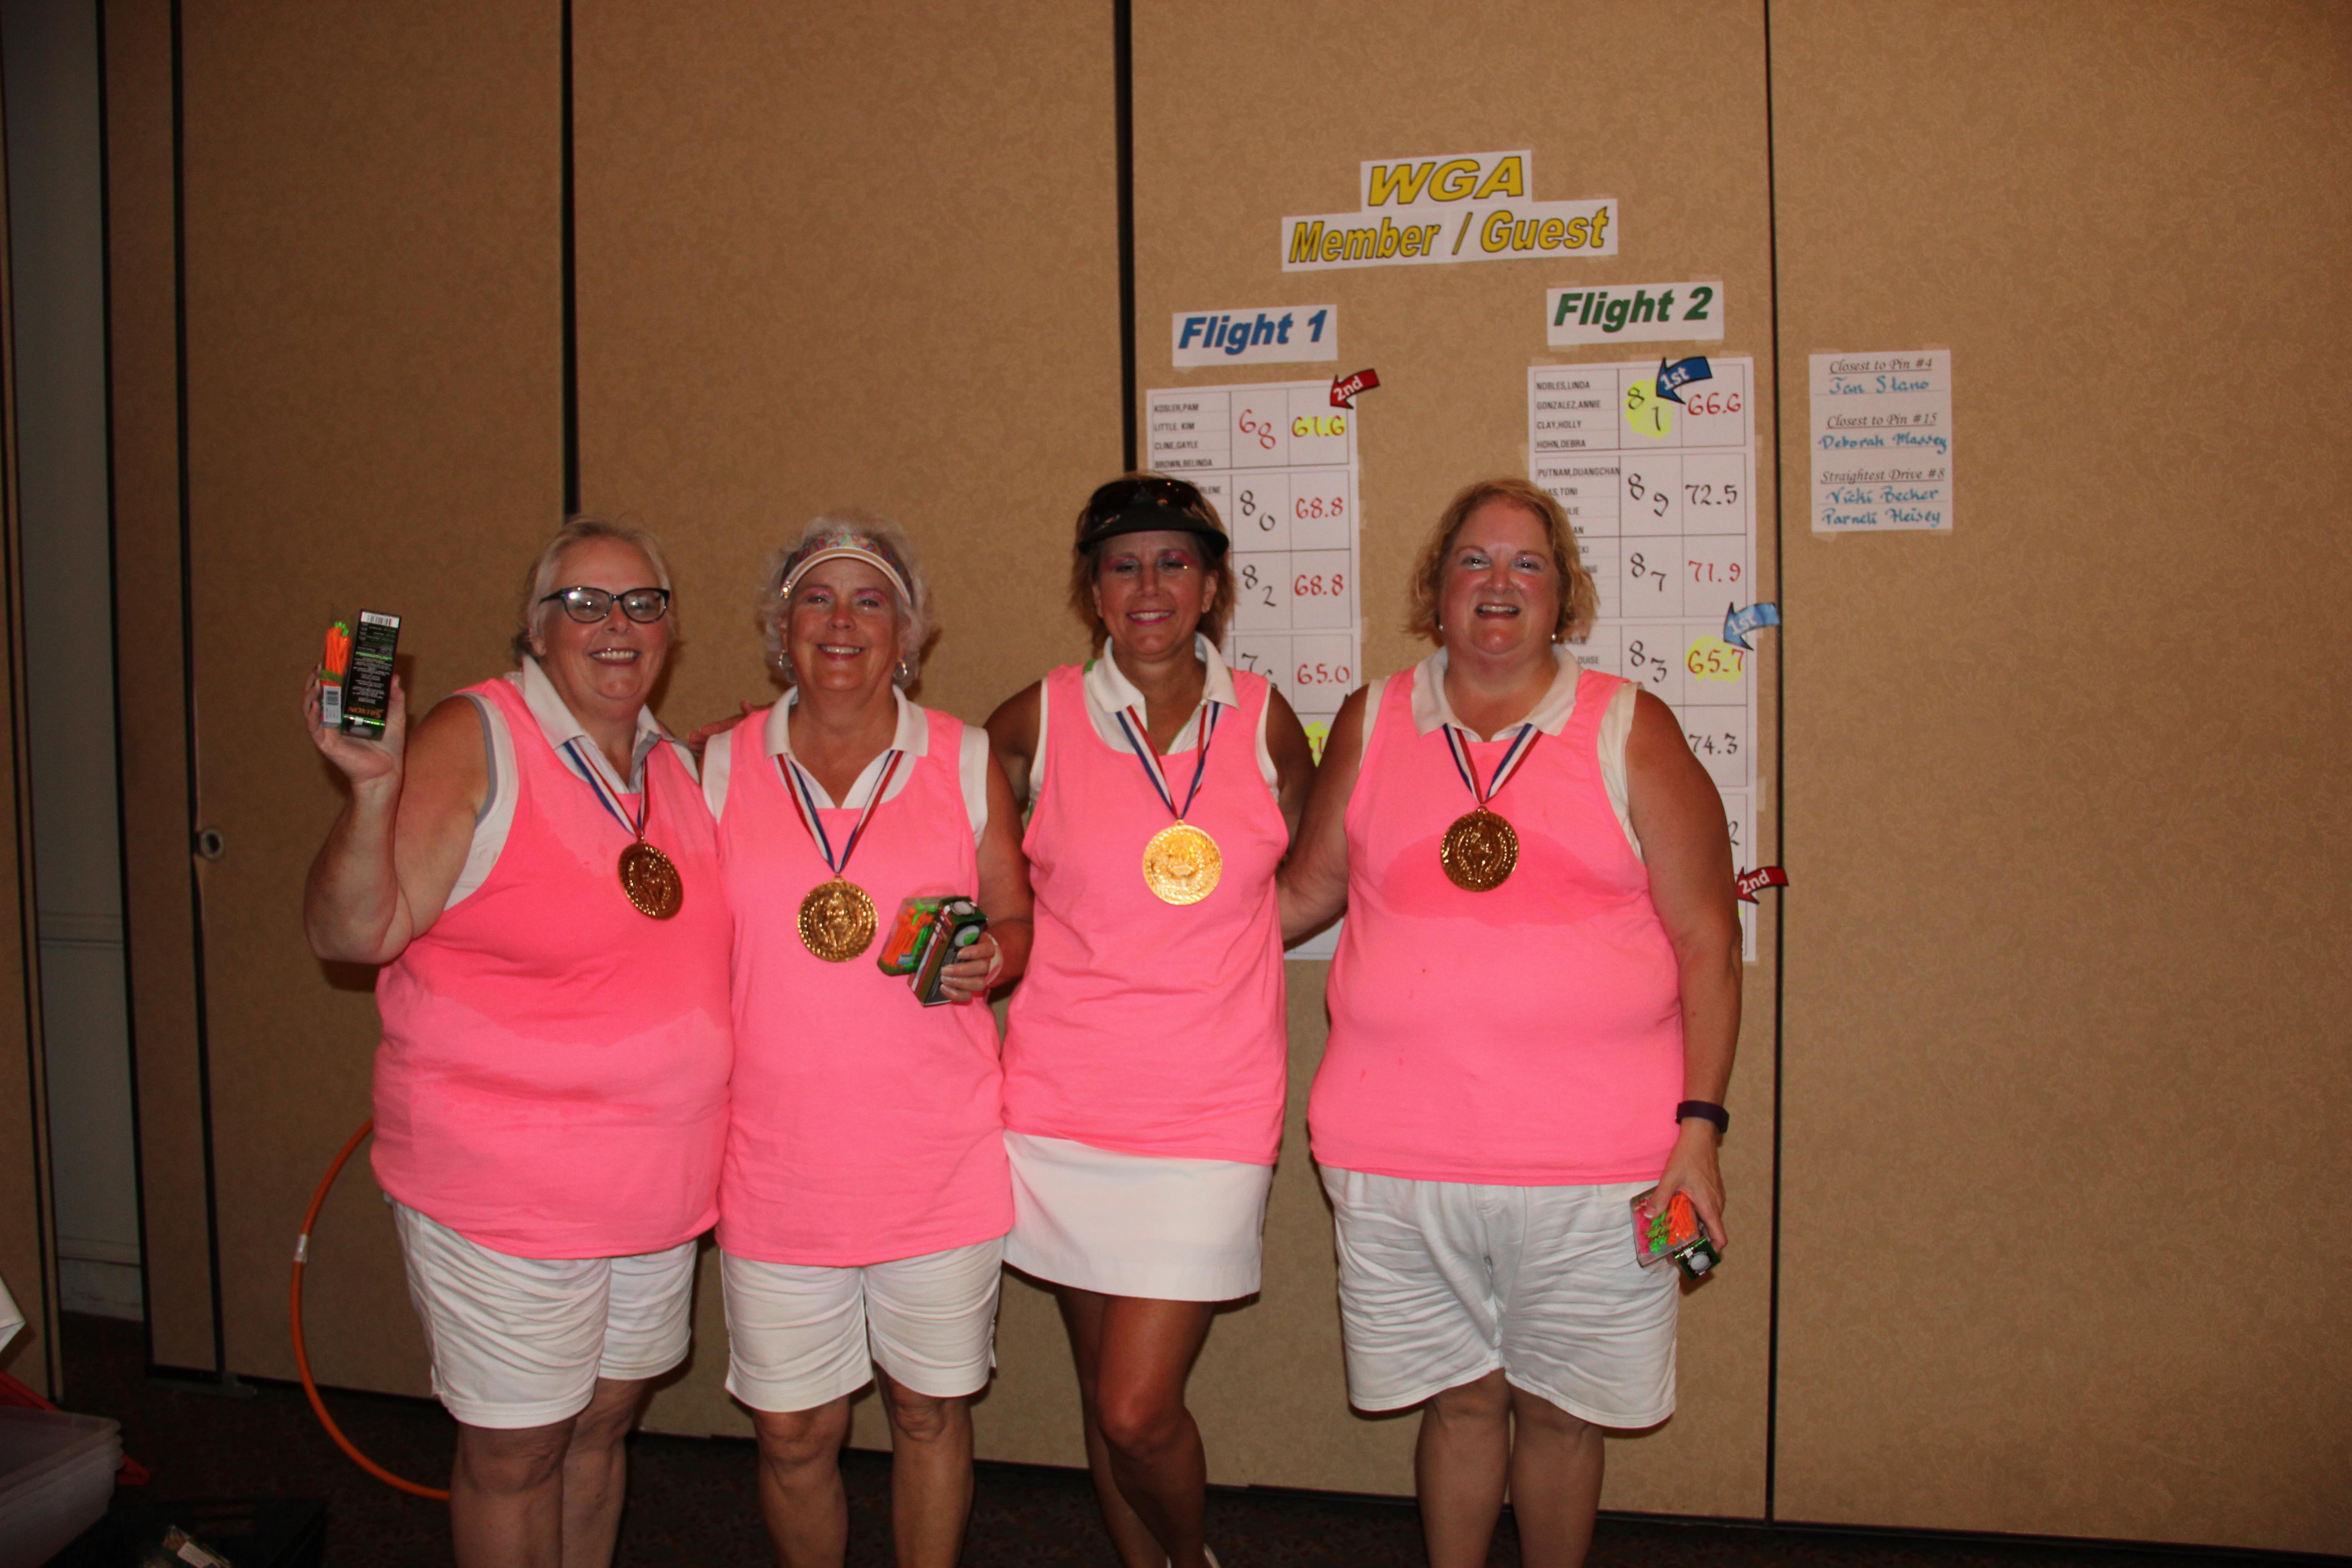 2016 Member/Guest Tournament